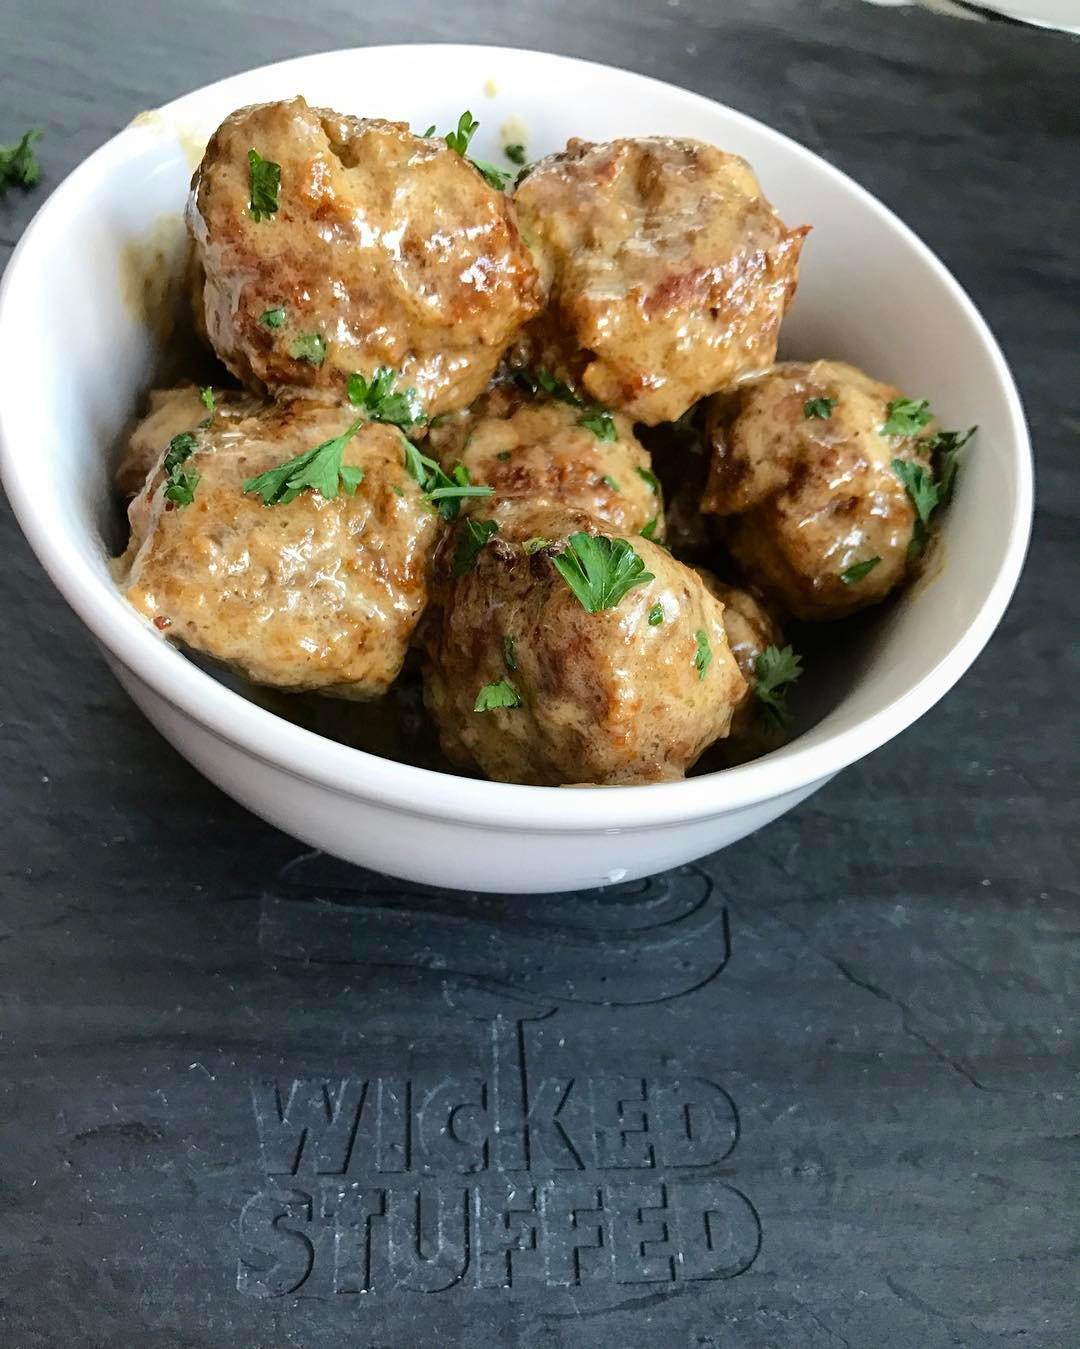 Keto Dinner Recipes  Keto Swedish Meatballs Grain Free & Low Carb